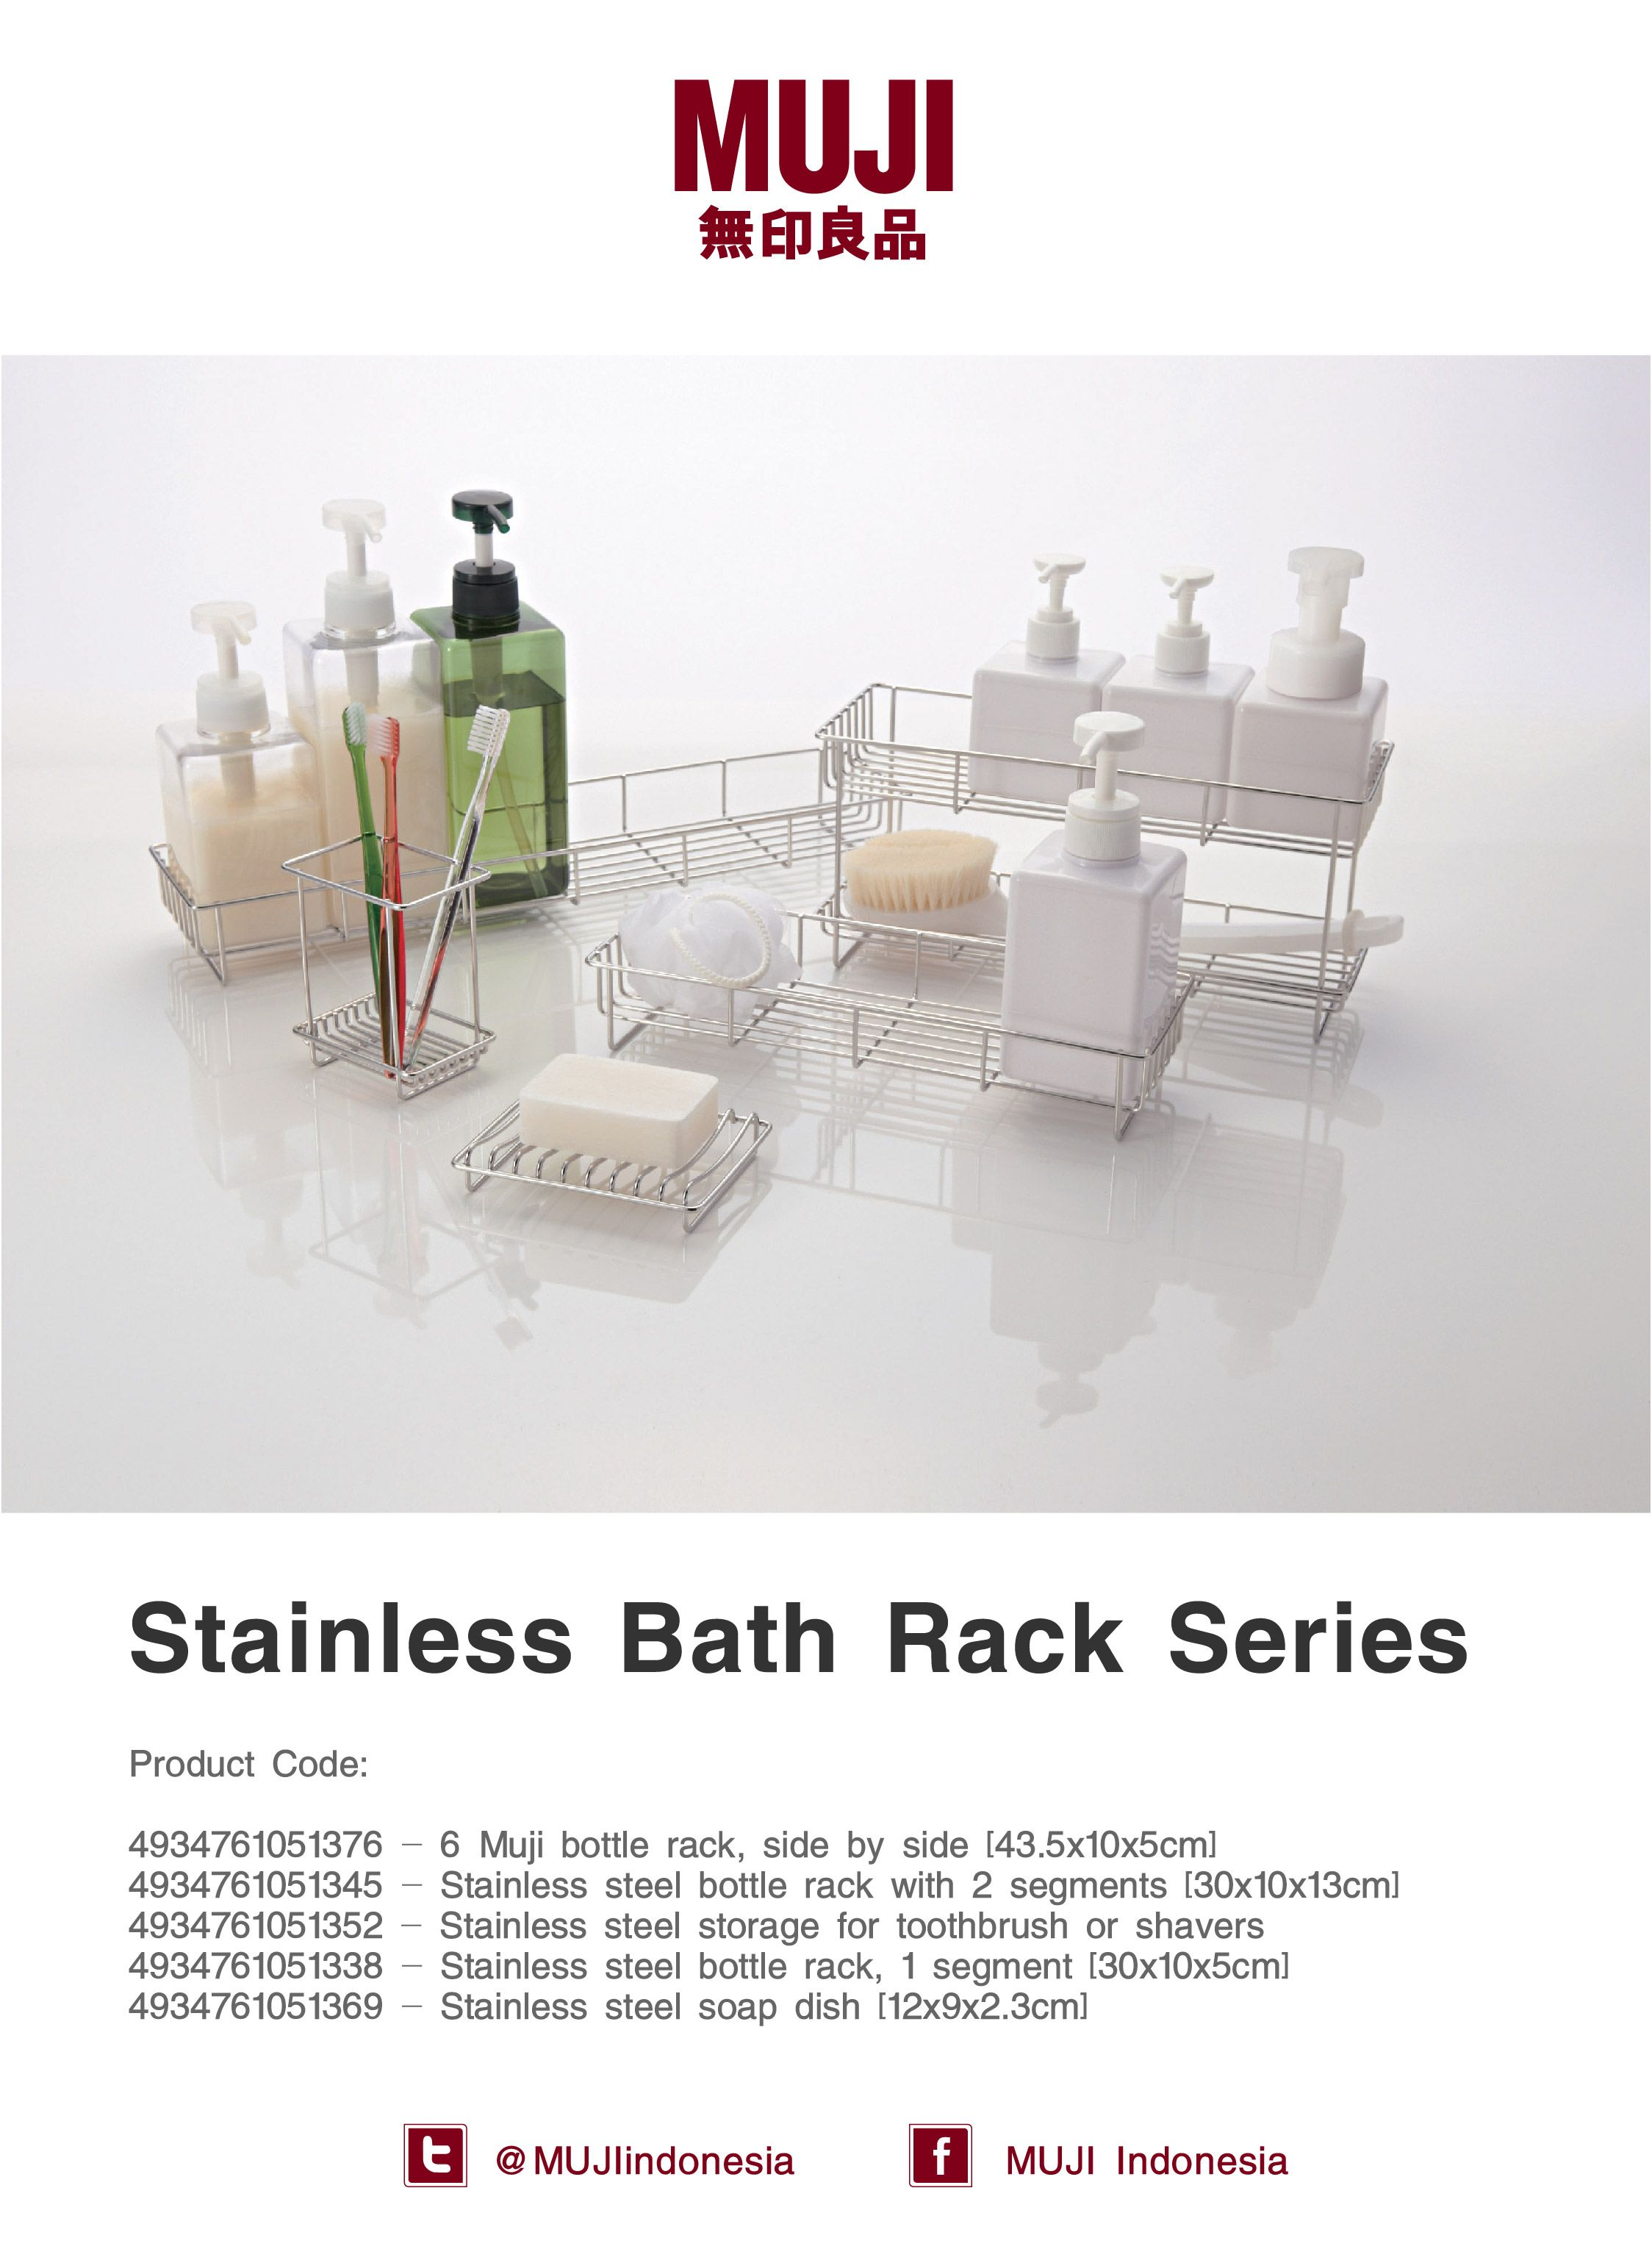 Stainless Bath Rack Series Bathroom accessories